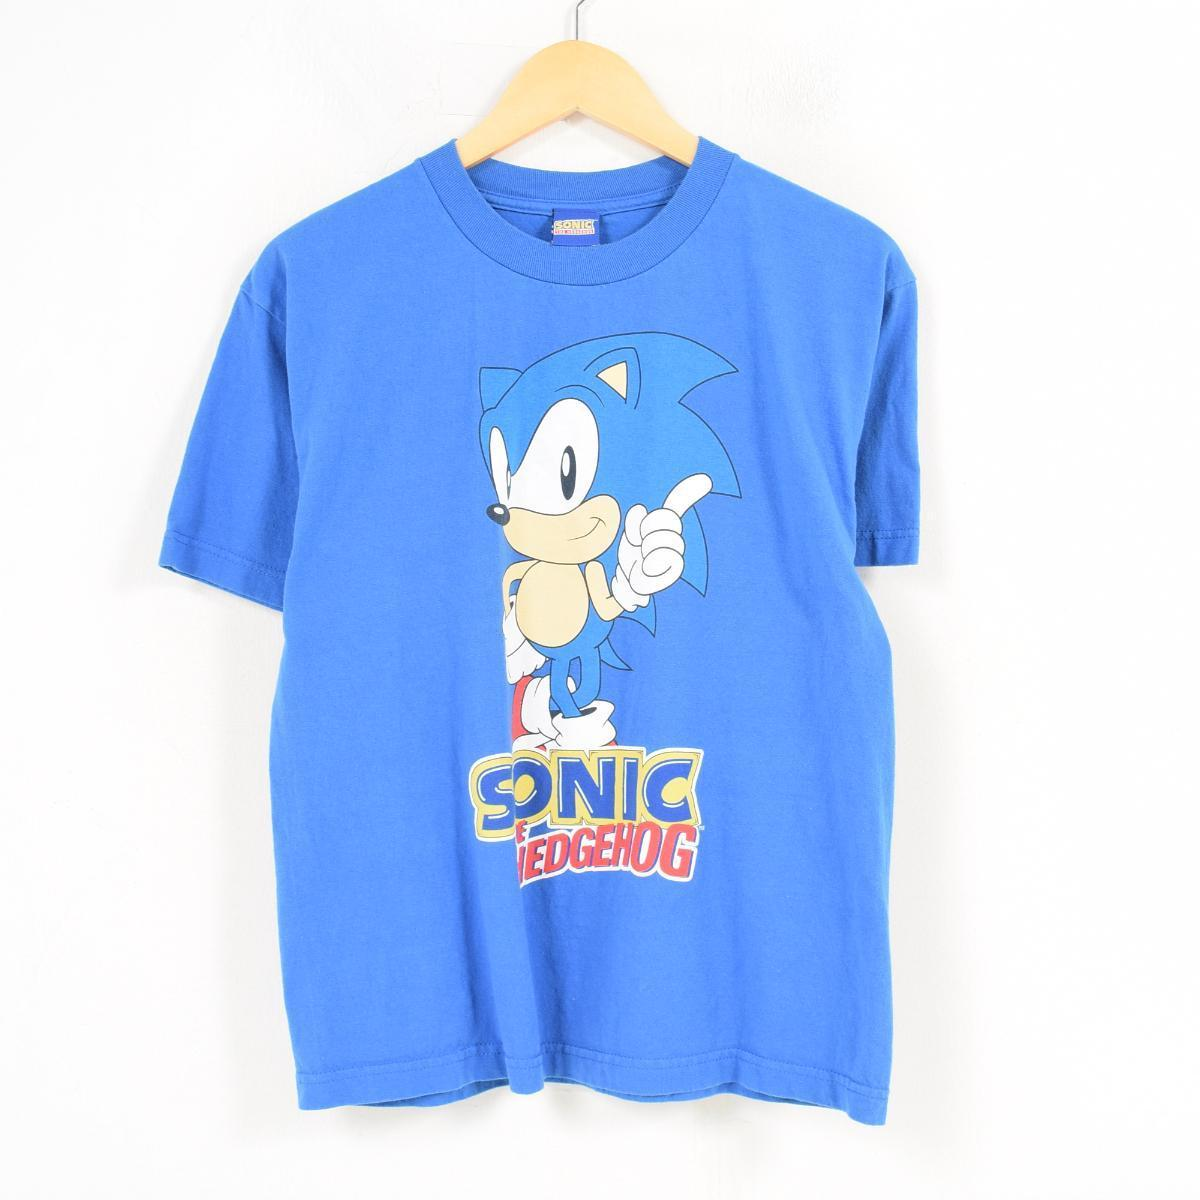 Vintage Clothing Jam Sonic The Hedgehog ソニックザヘッジホッグ